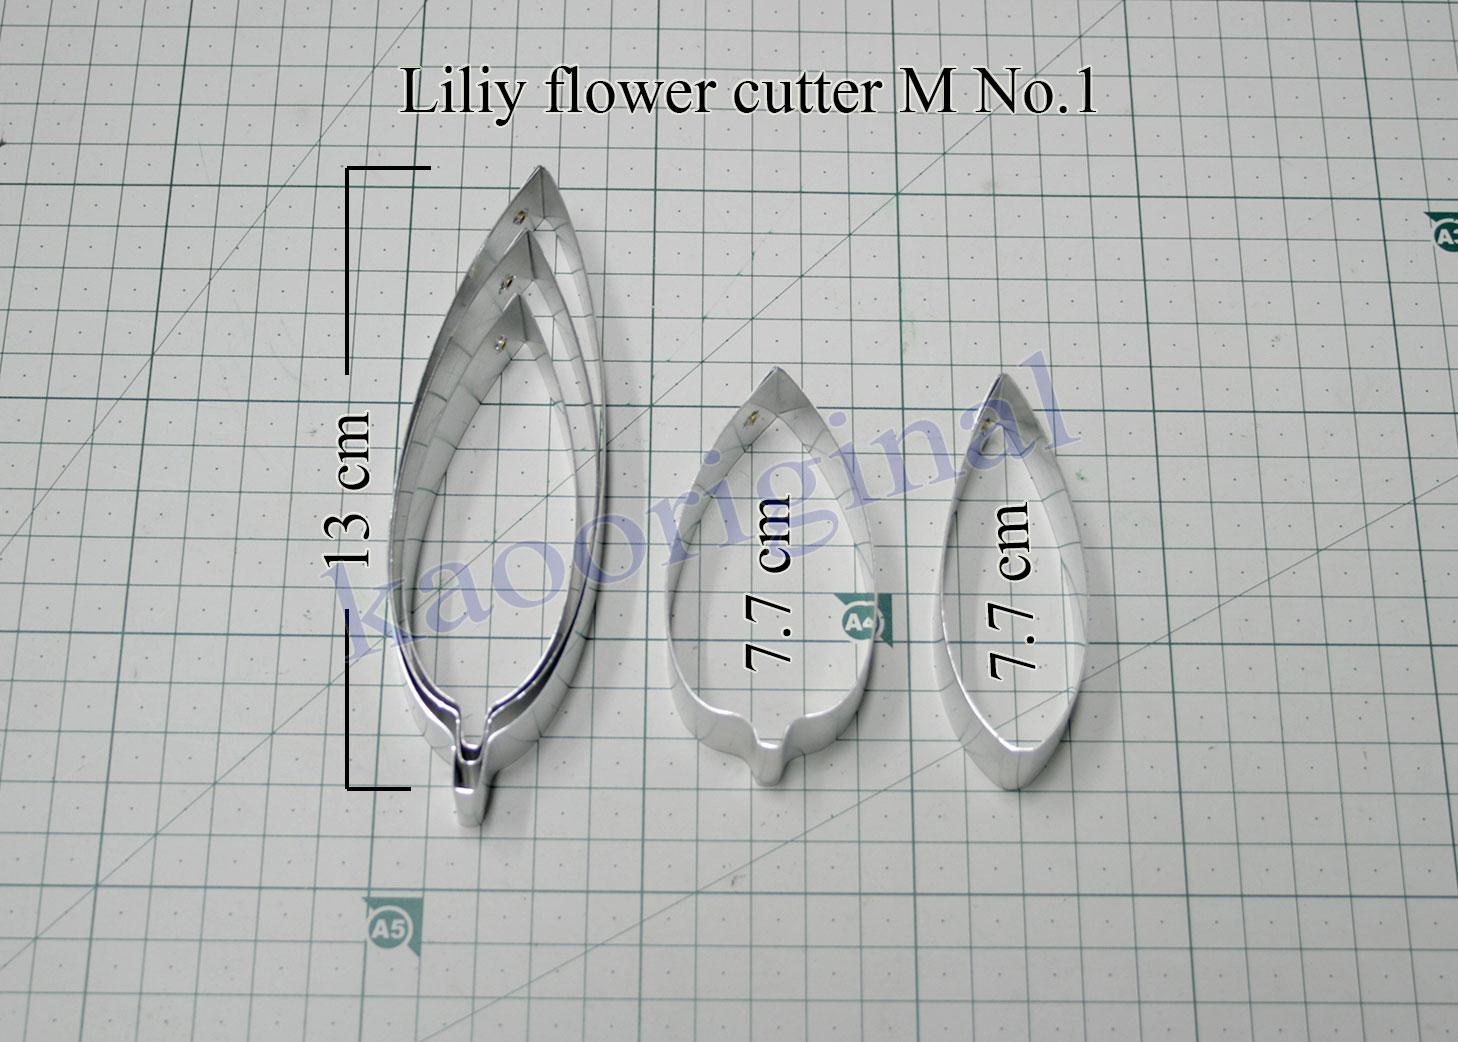 Lily flower S M L complete set <br> ดอกลิลลี่ S M L ชุดสมบูรณ์ <br> SKU: 3503 - M No.1